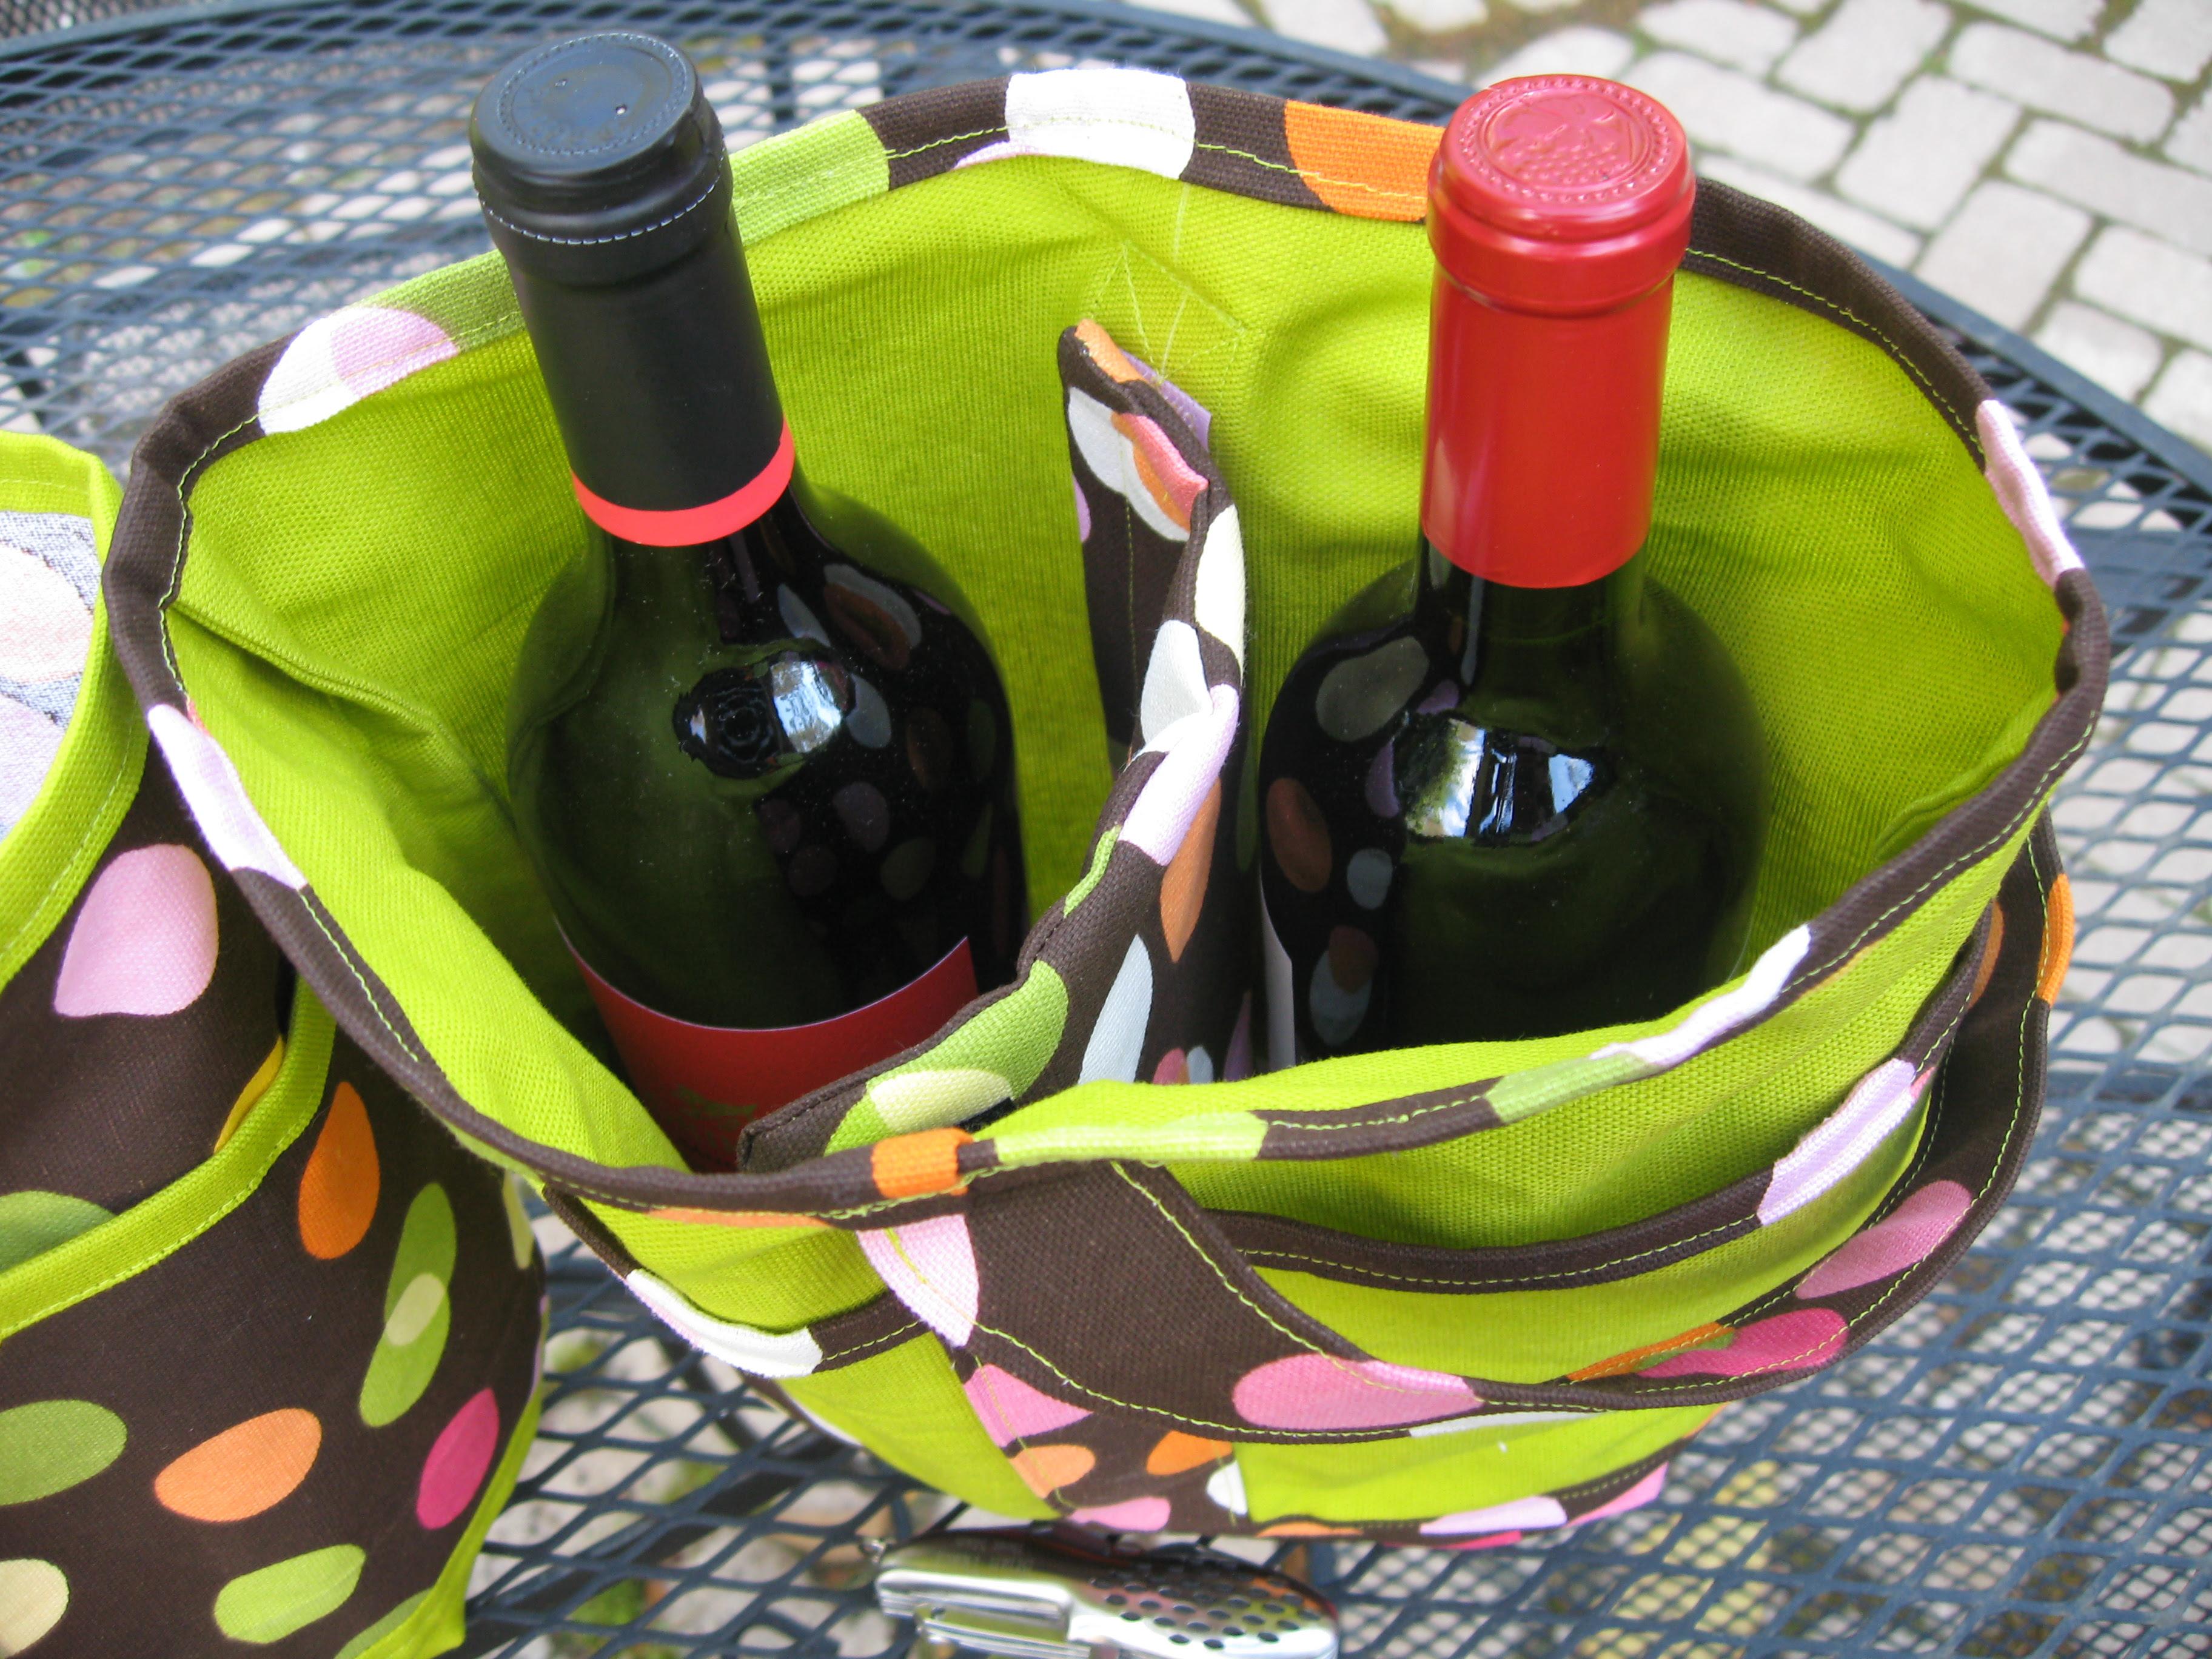 Sewing Pattern Bottle Bag